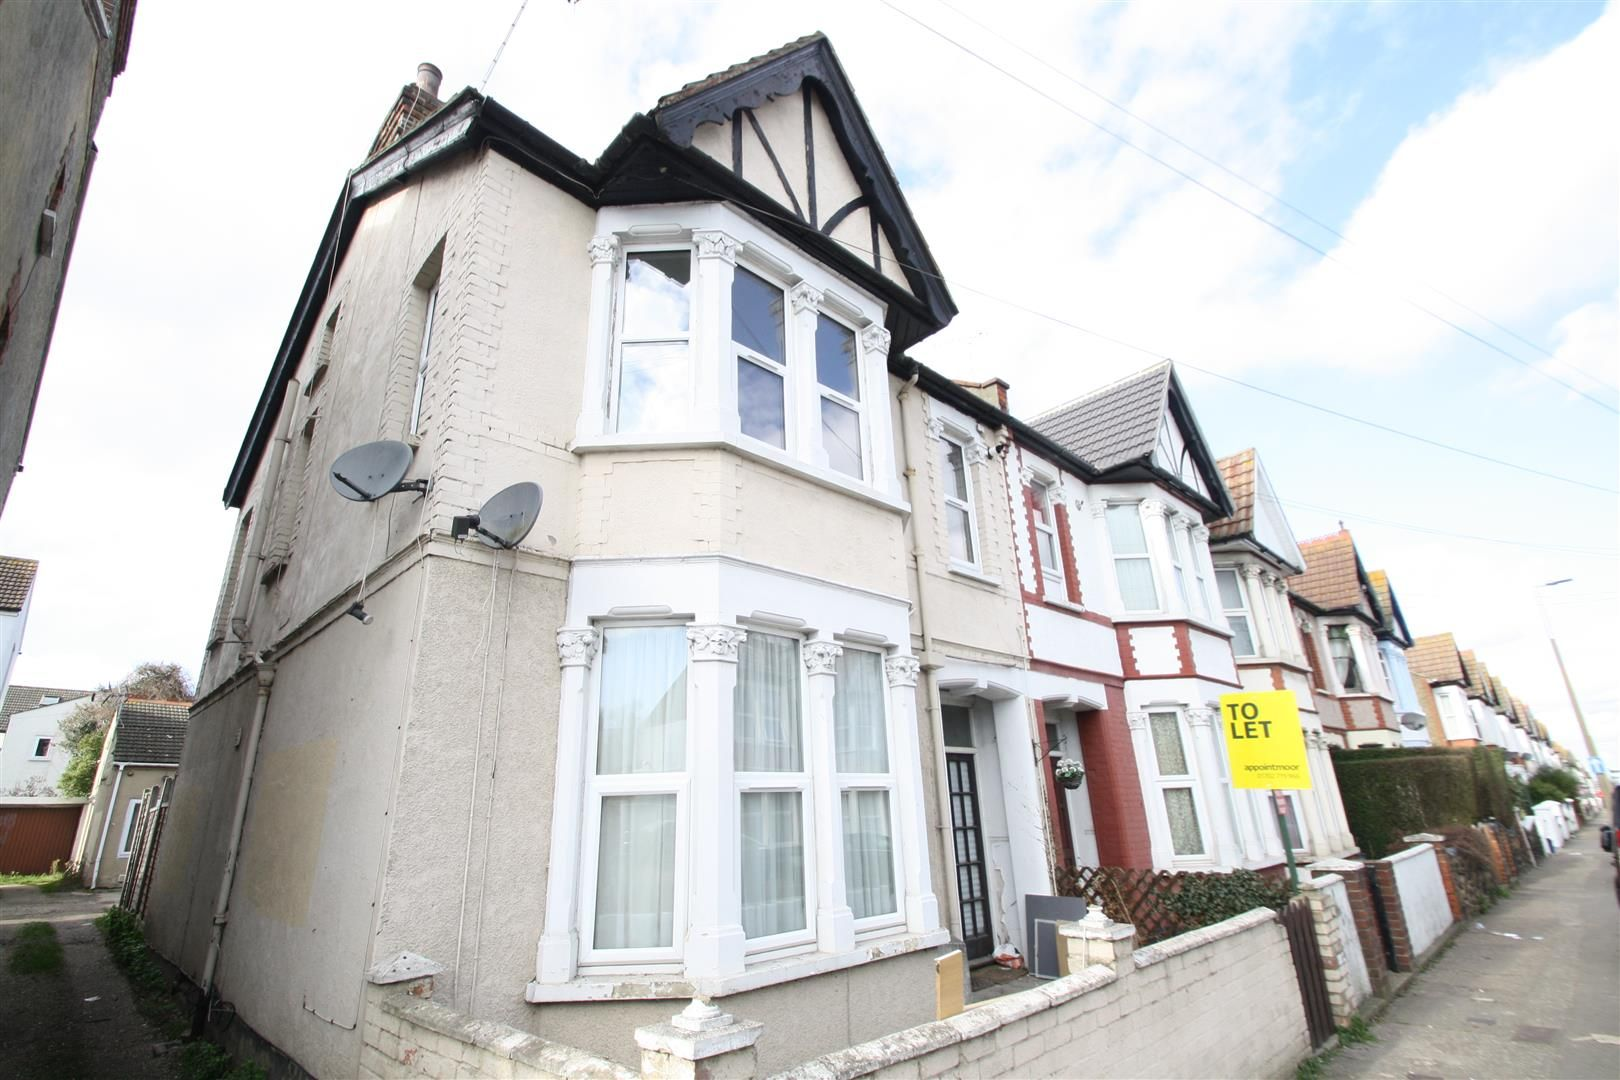 Property photo 1 of 7. Img_7530.Jpg